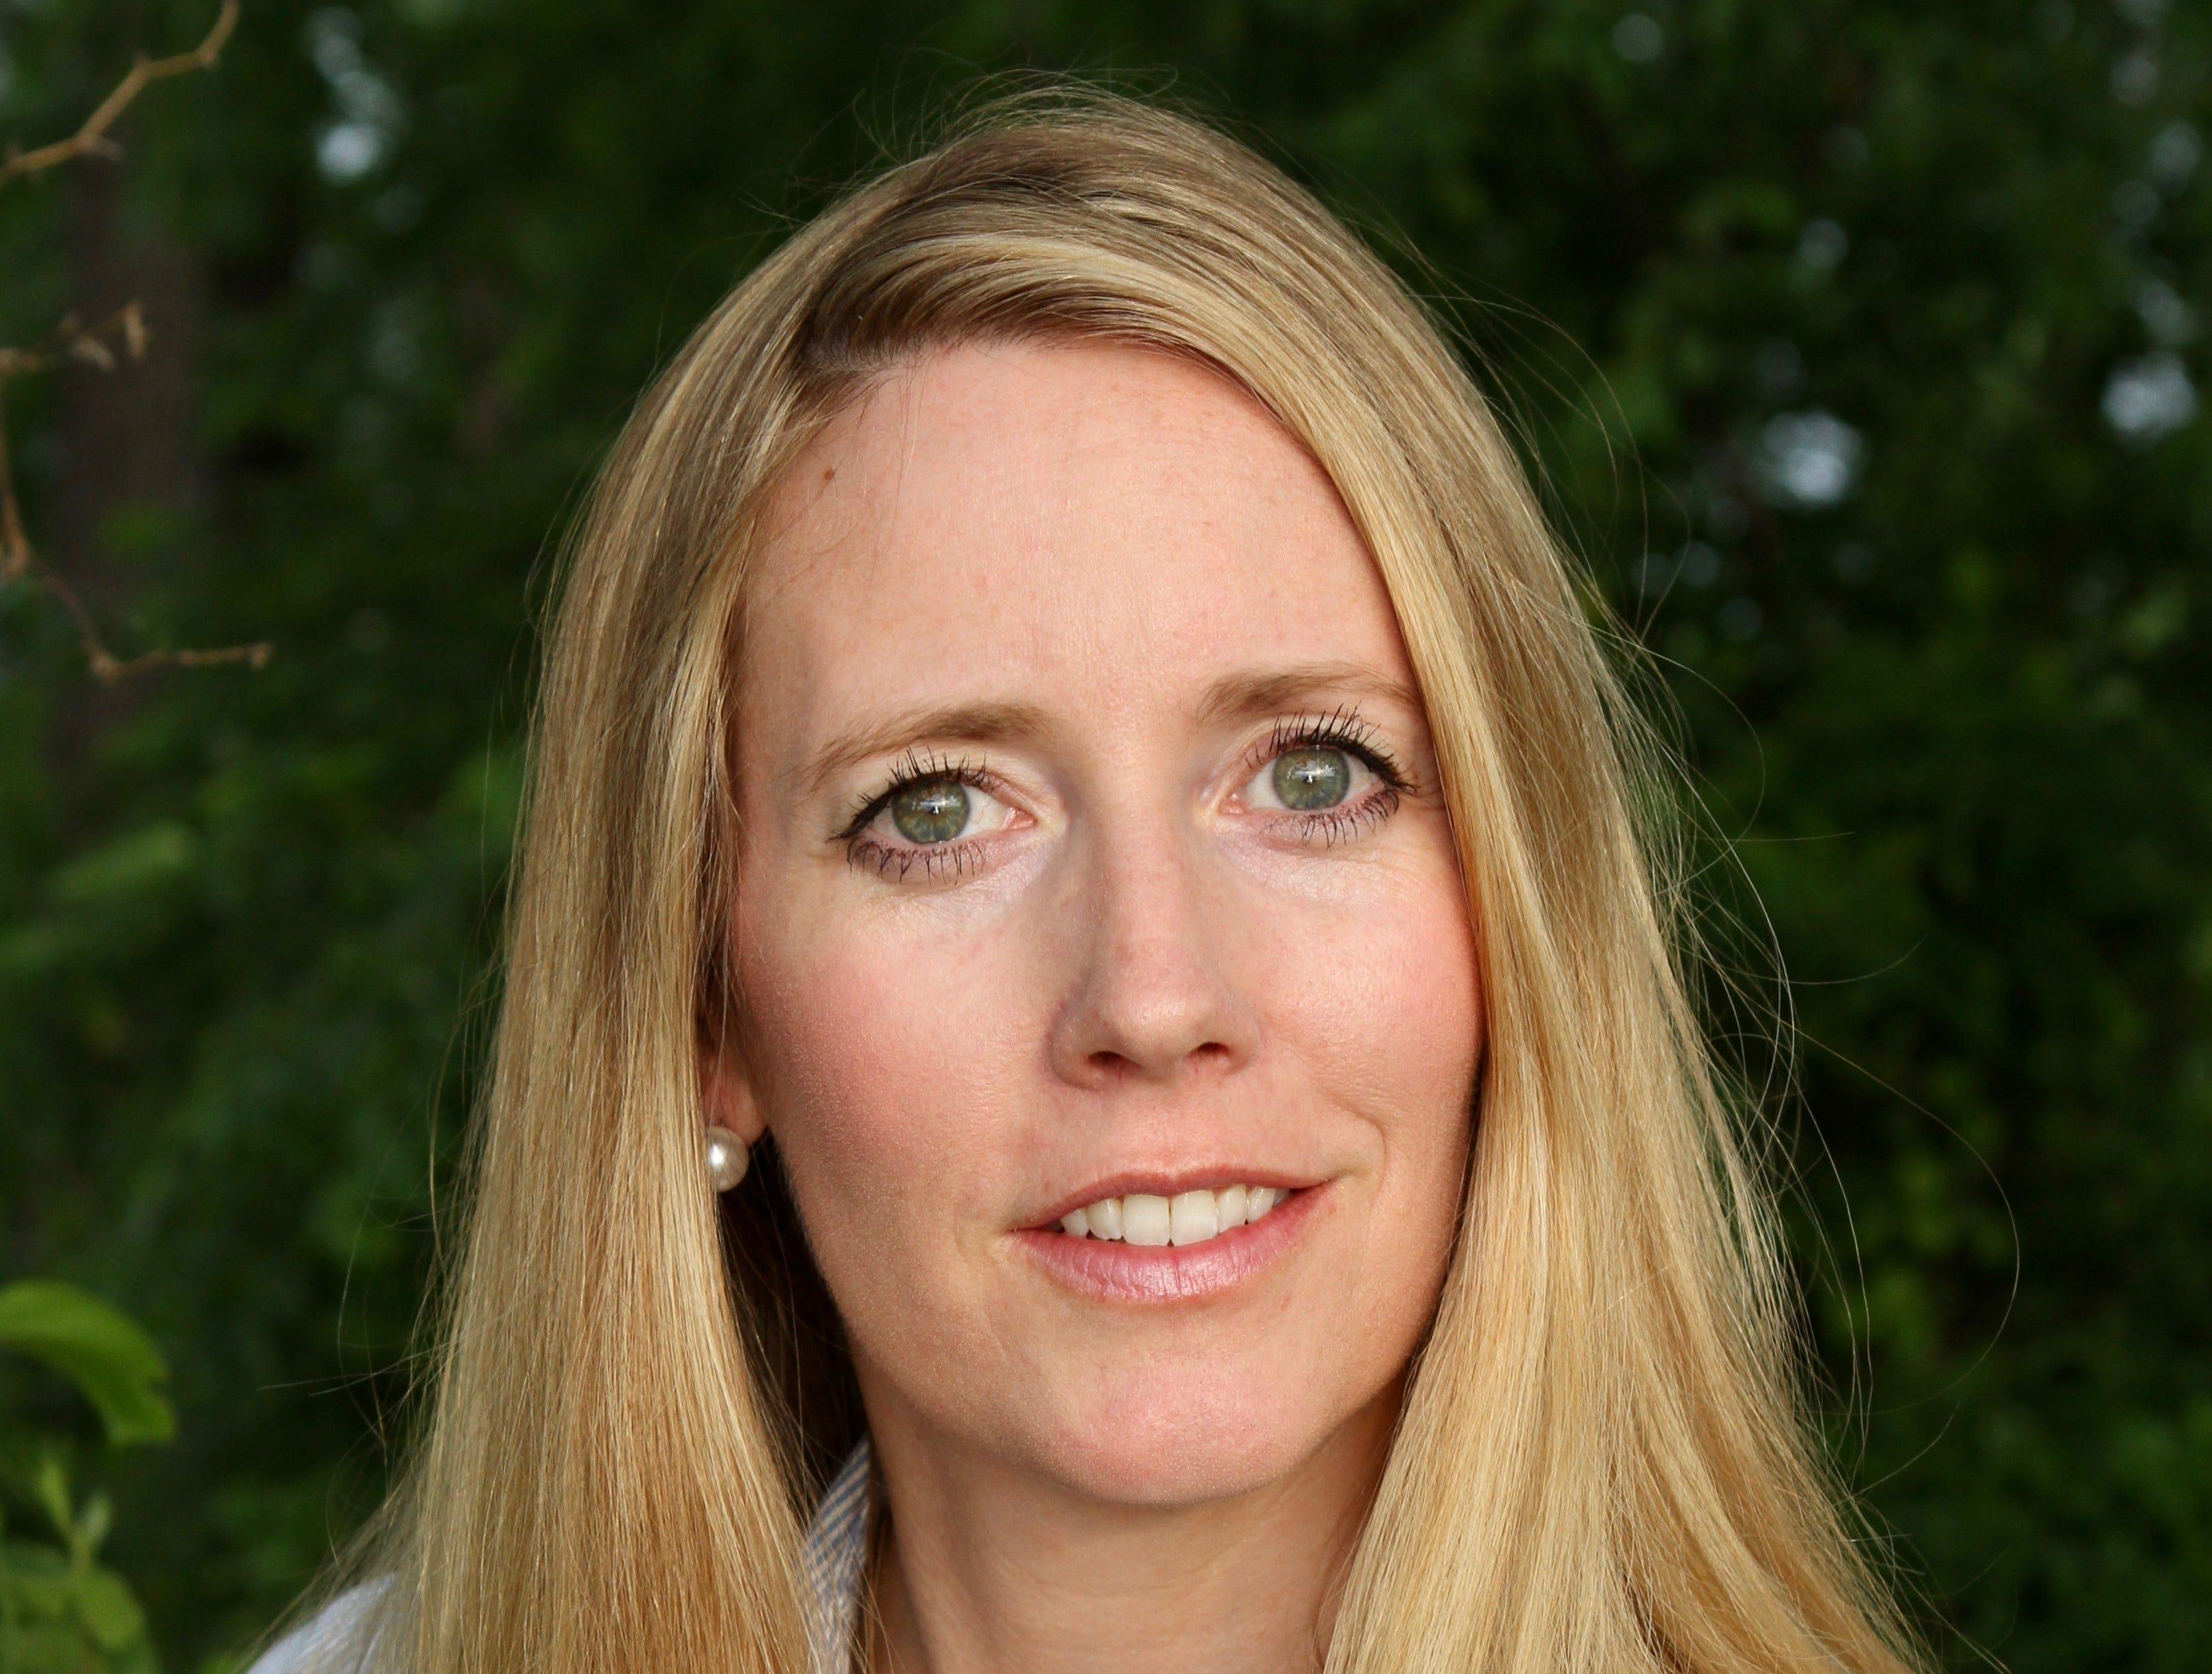 Delaware Treasurer-elect Colleen Davis's arrest violated ethics rules, GOP says